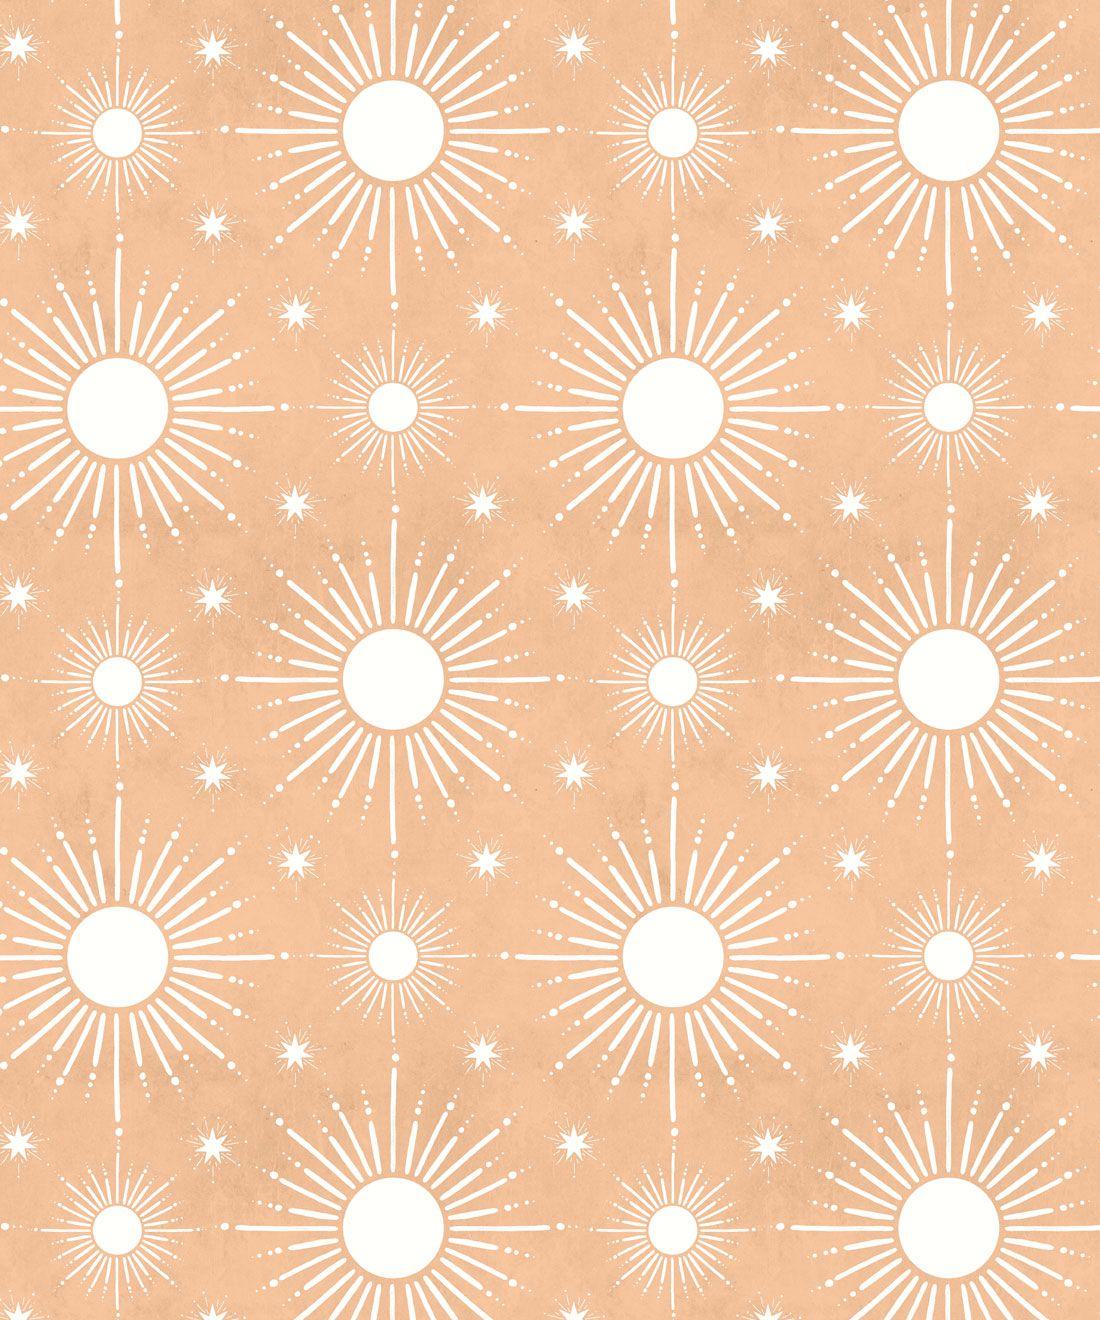 Sun Light Star Bright Wallpaper • Salmon• Swatch